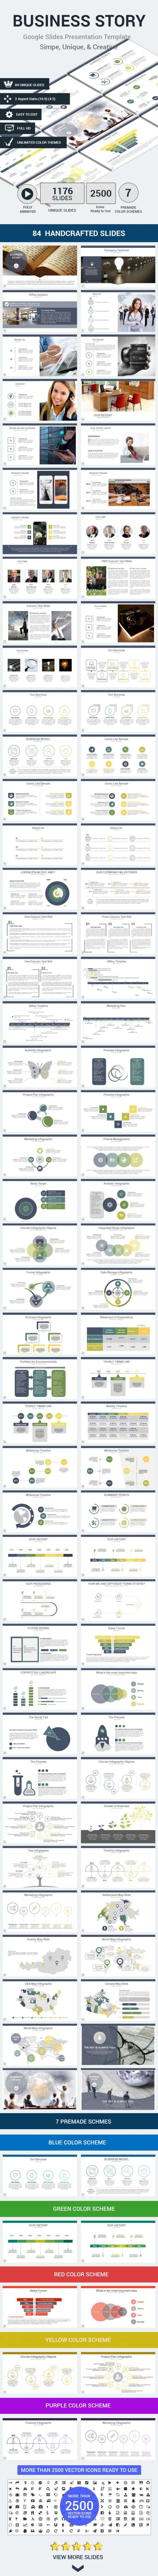 business tale google slides presentation template